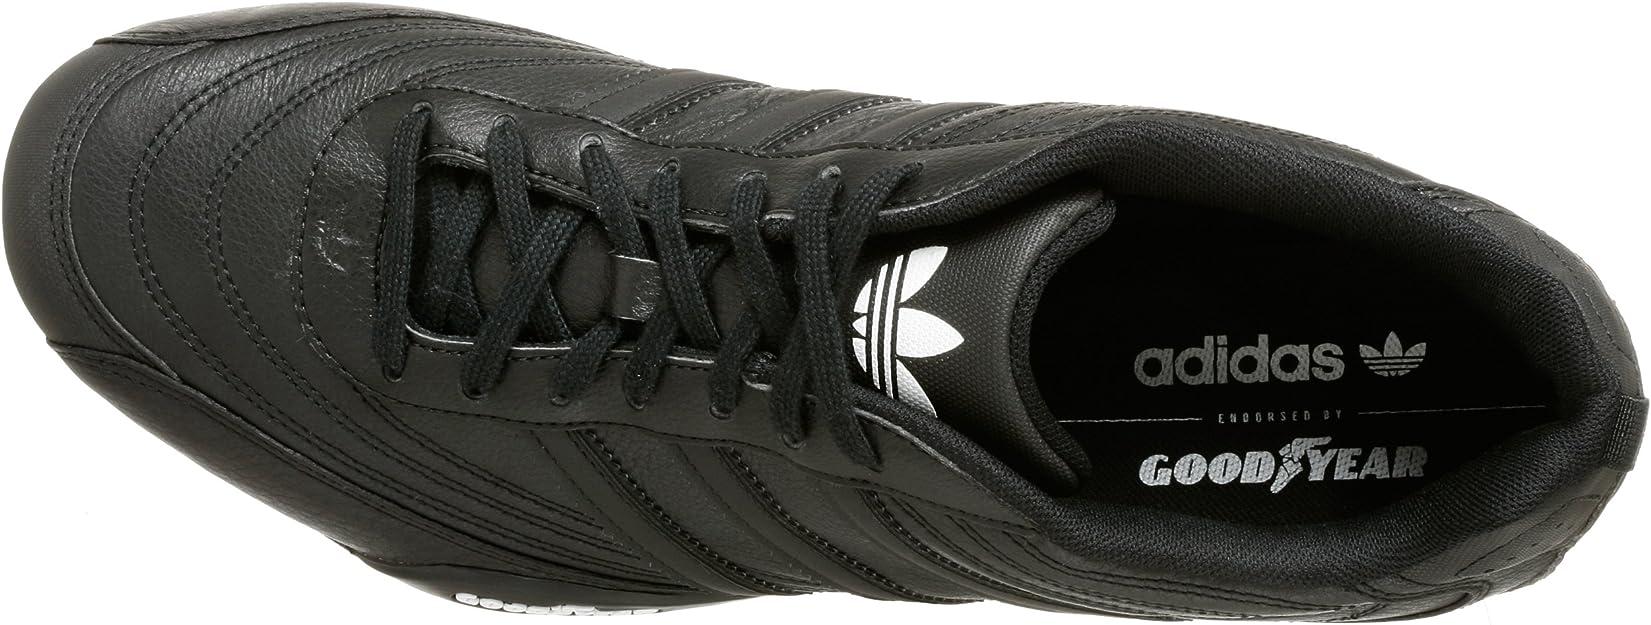 gran colección oficial de ventas calientes reputación confiable Amazon.com: adidas Originals hombre GOODYEAR STREET SNEAKER: Shoes